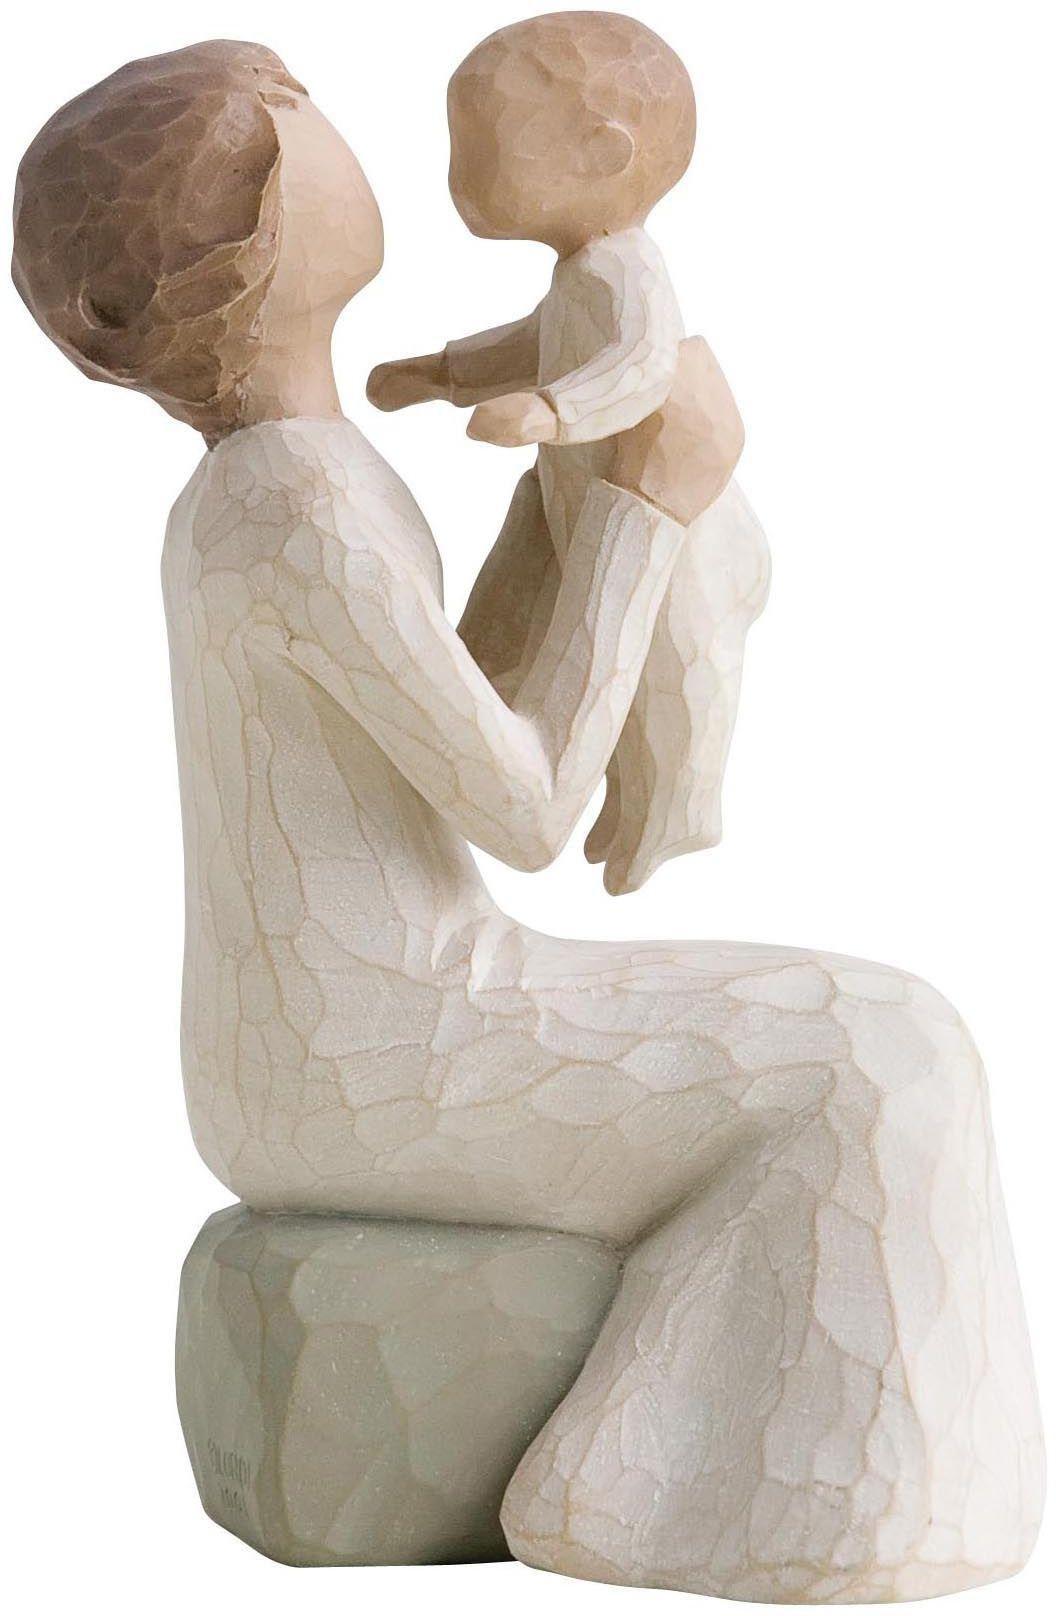 Willow Tree - Grandmother - Figurine lowest price